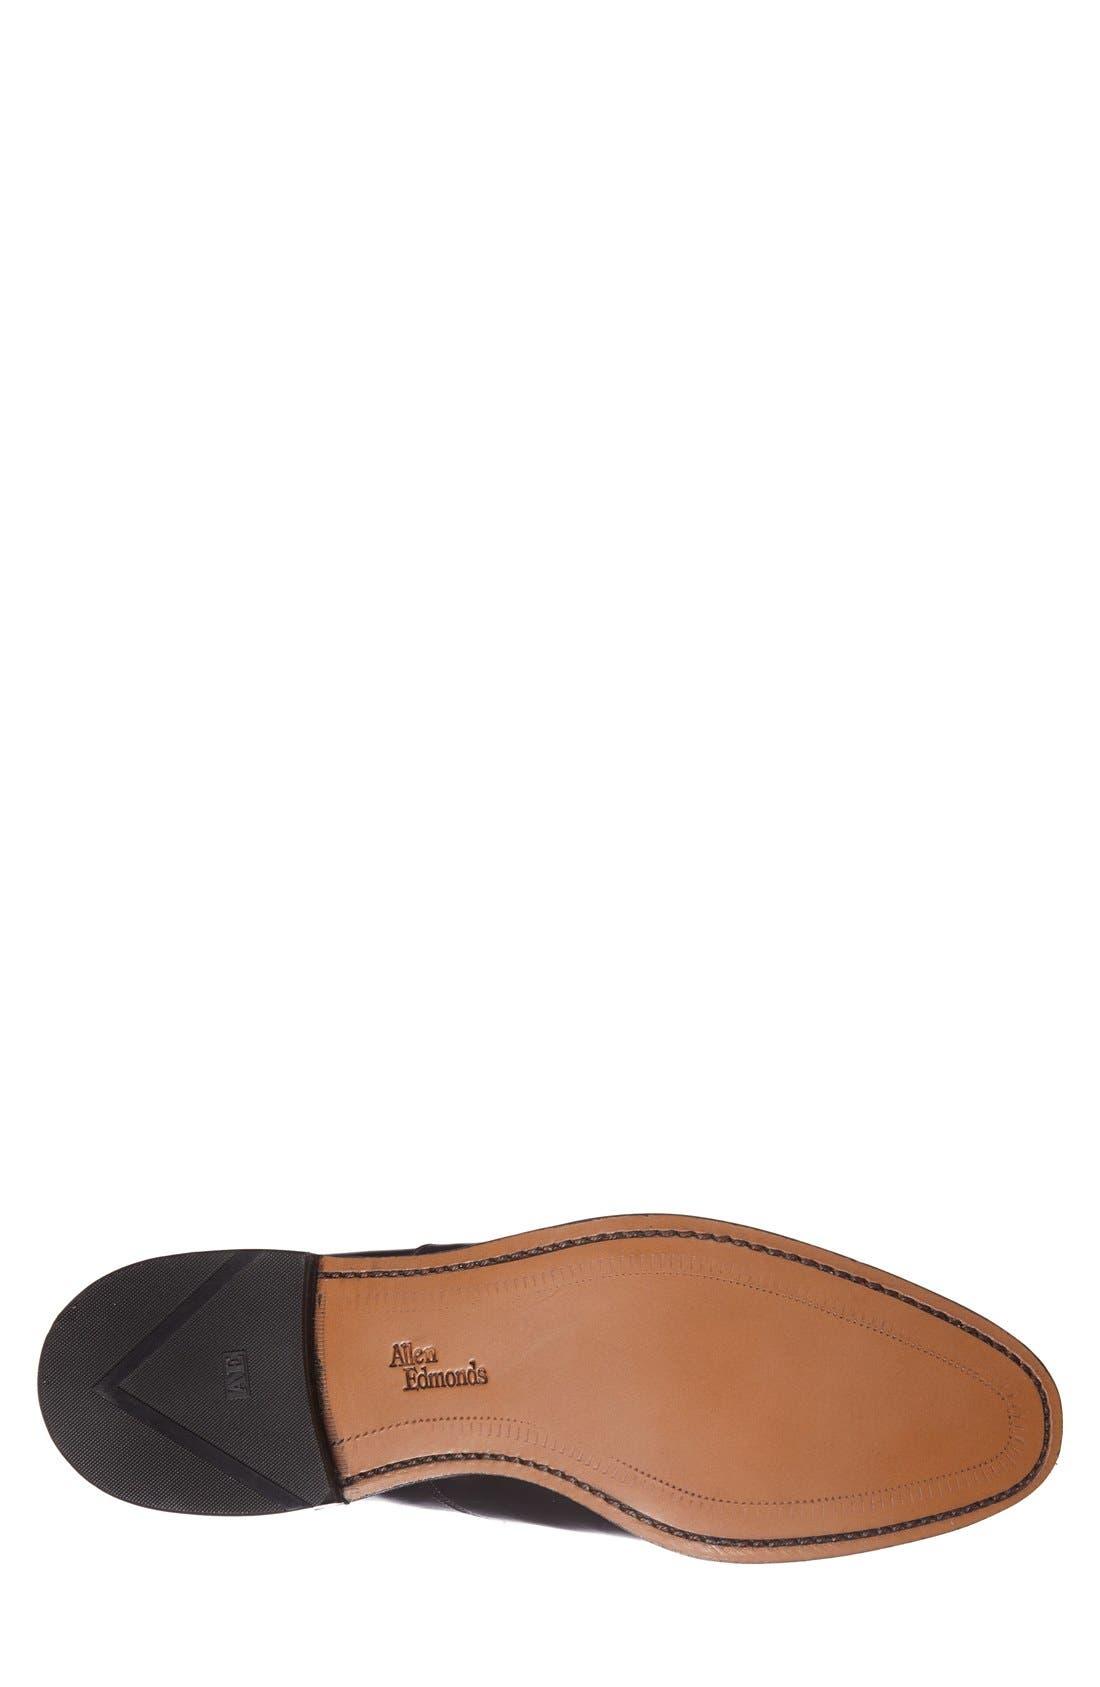 Carlyle Plain Toe Oxford,                             Alternate thumbnail 4, color,                             Black Leather